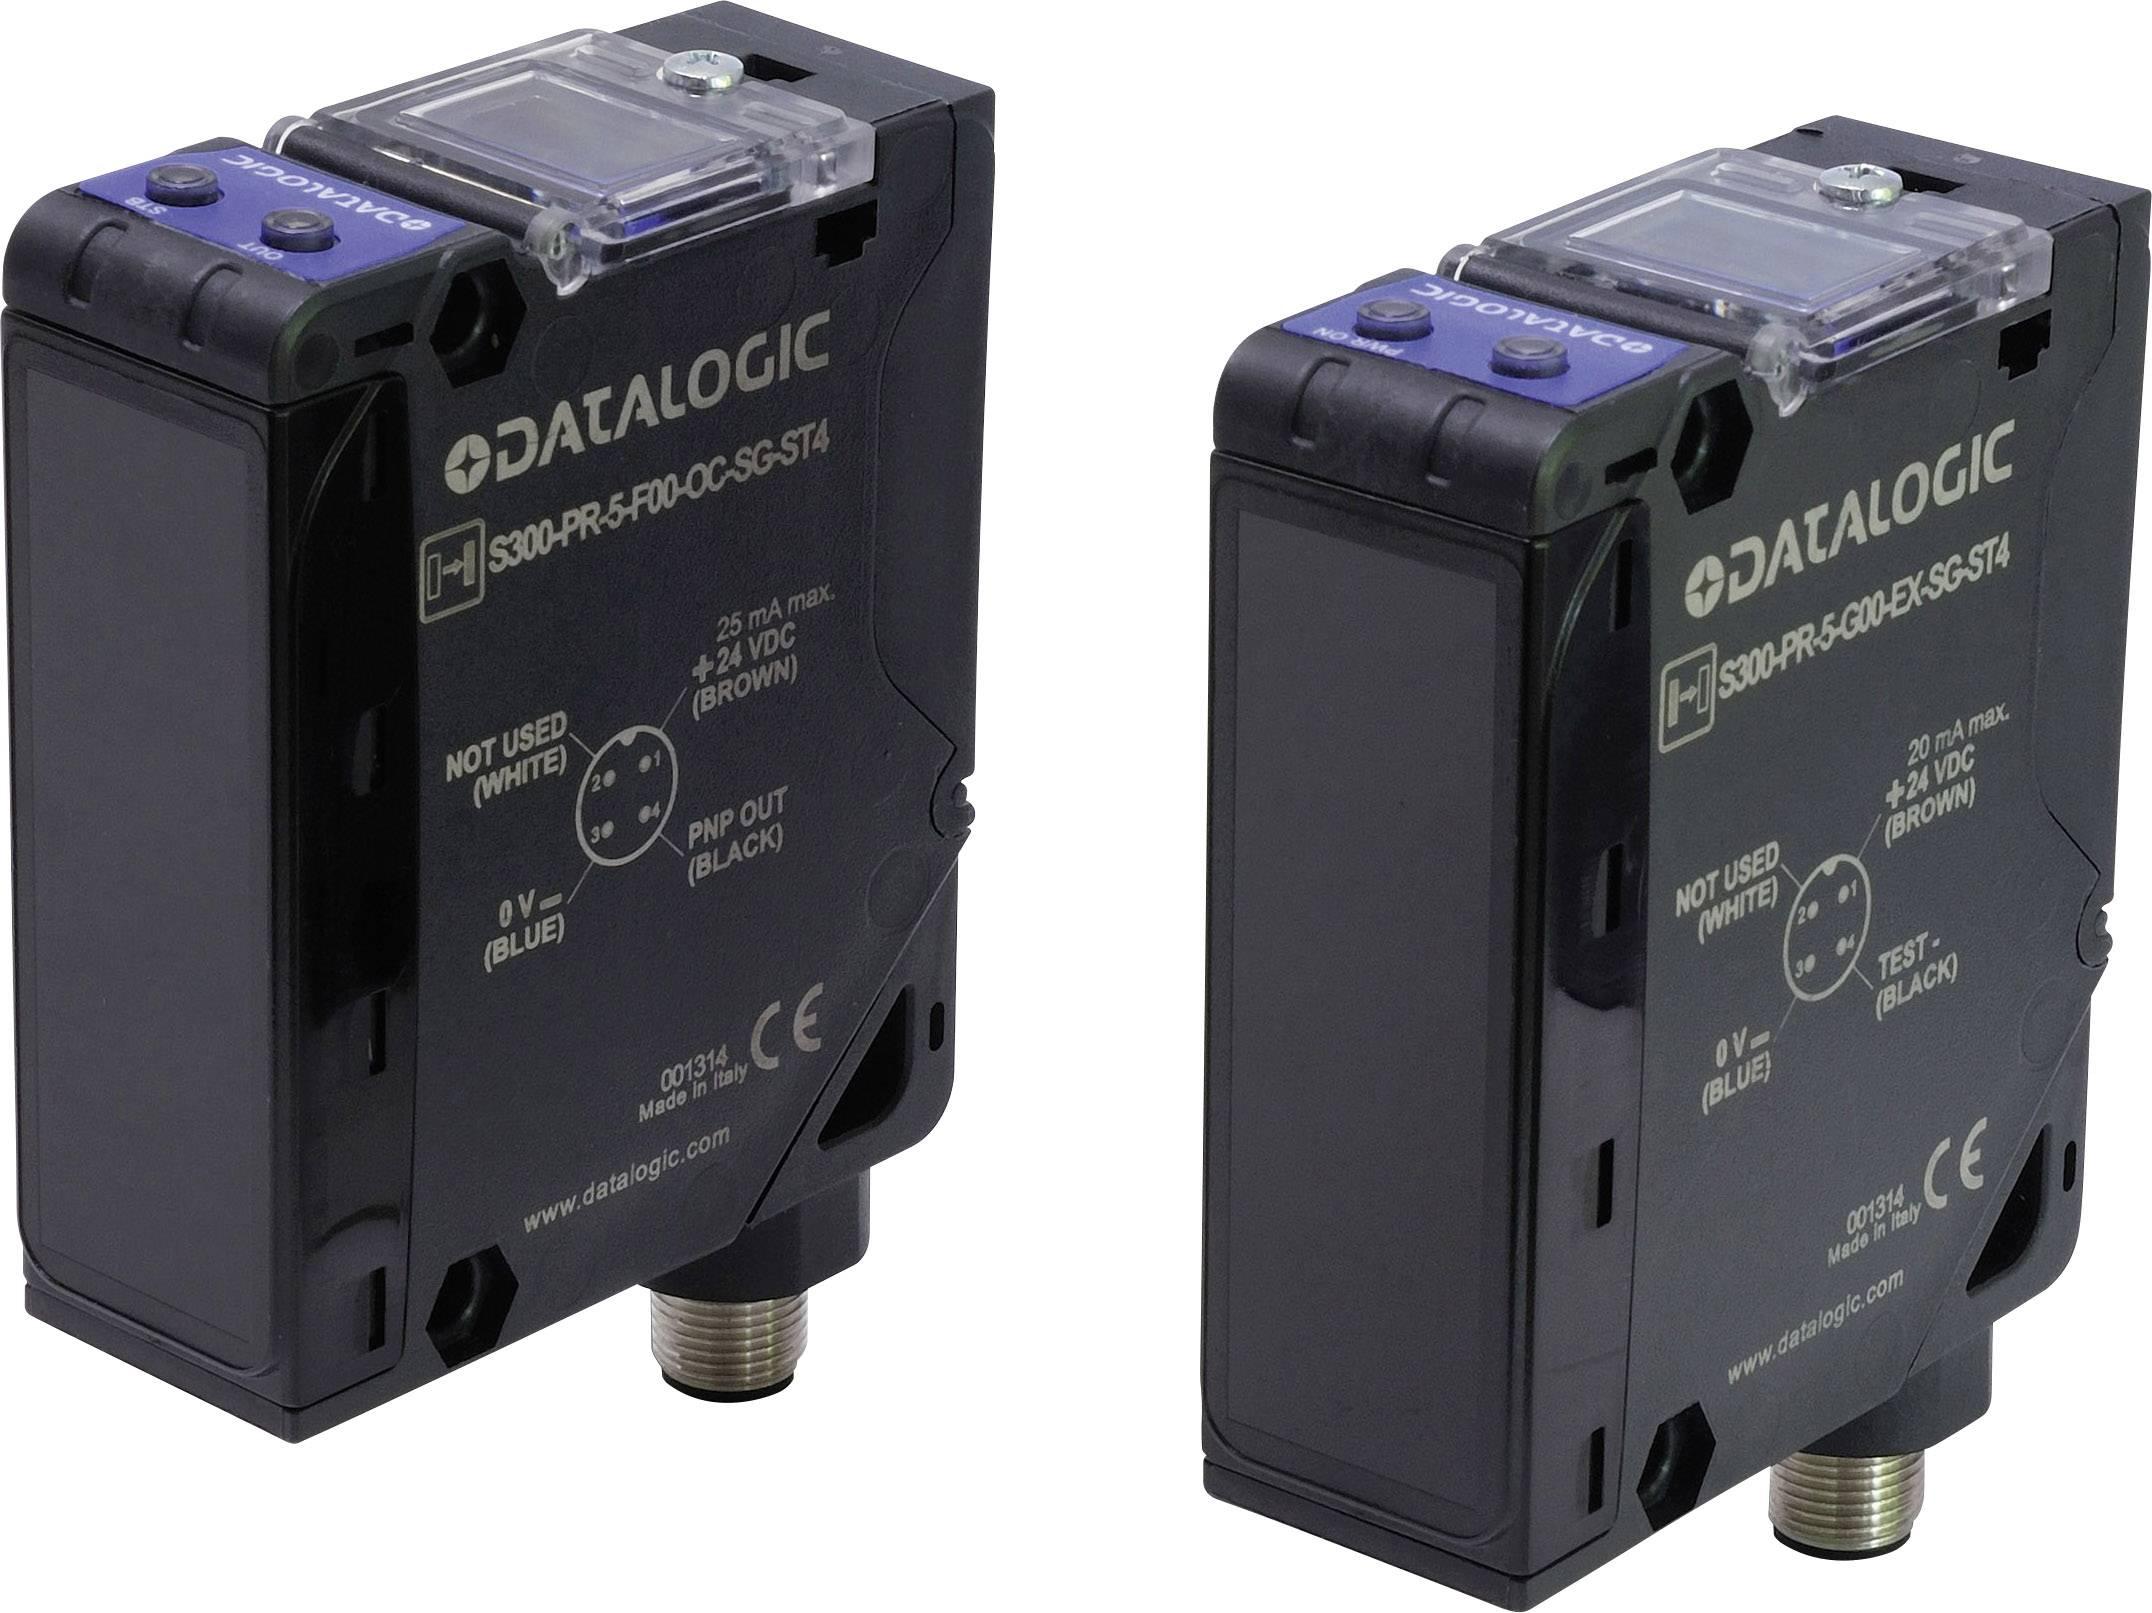 Reflexná svetelná závora DataLogic S300-PR-1-B06-RX 951451050, Max. dosah 22 m